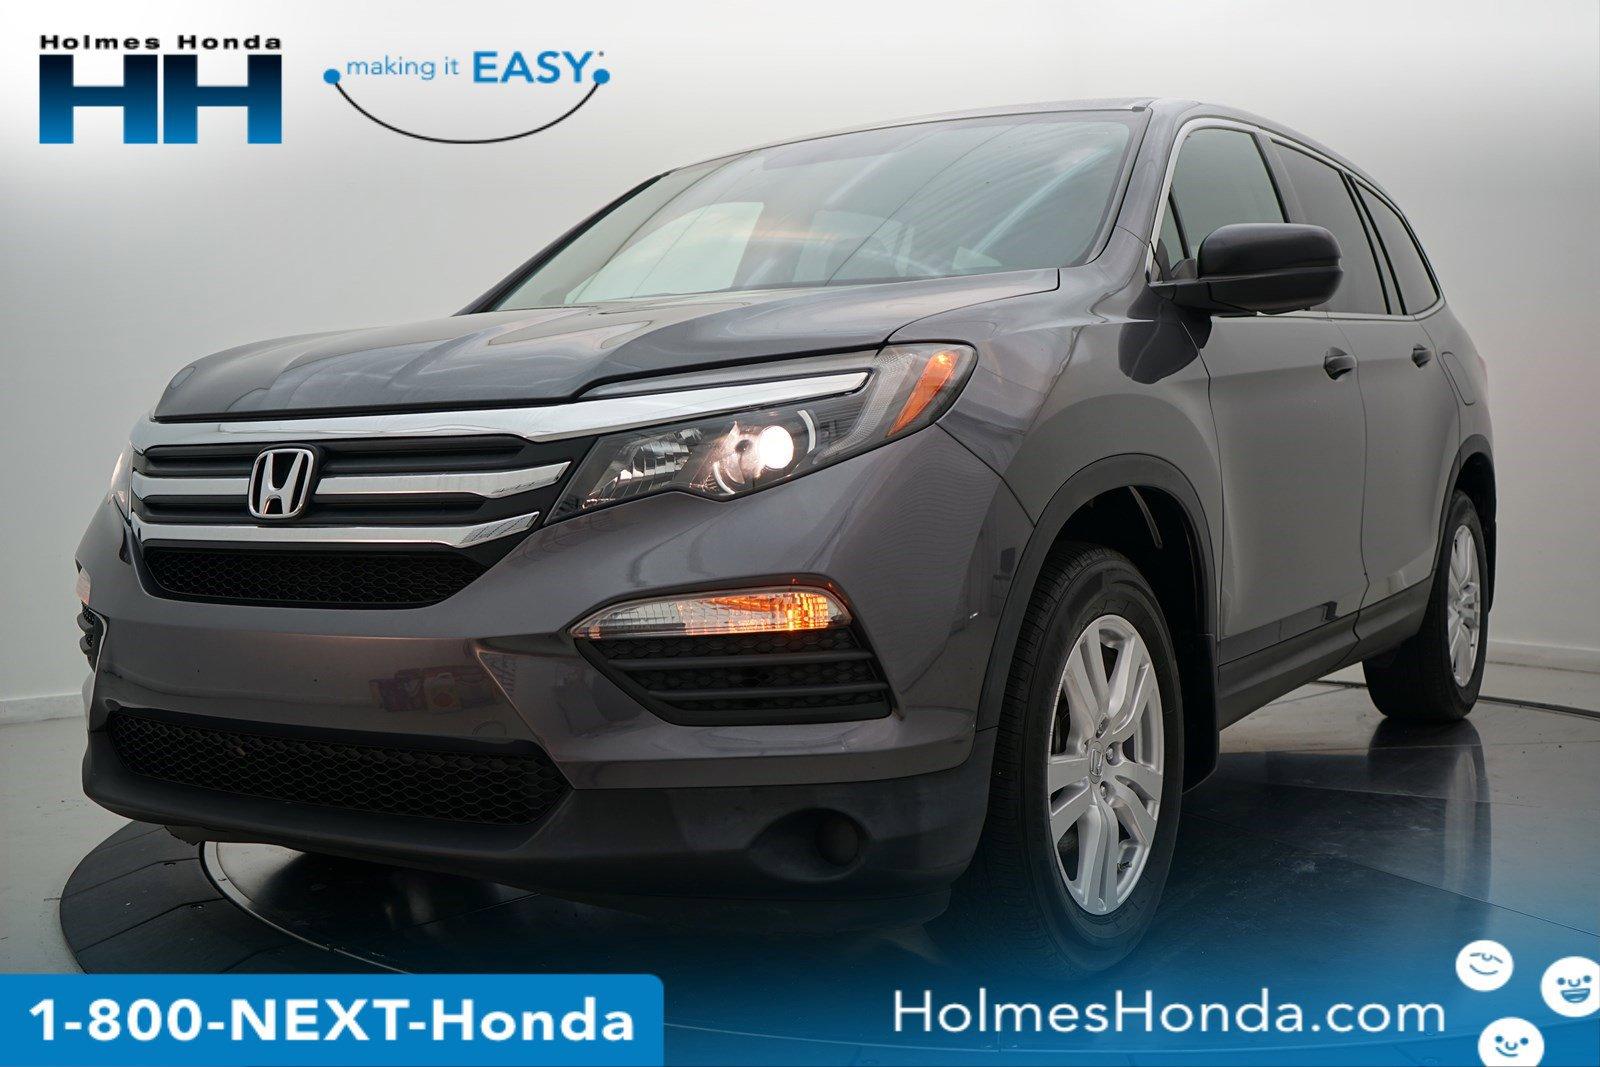 2017 Honda Pilot FWD LX image